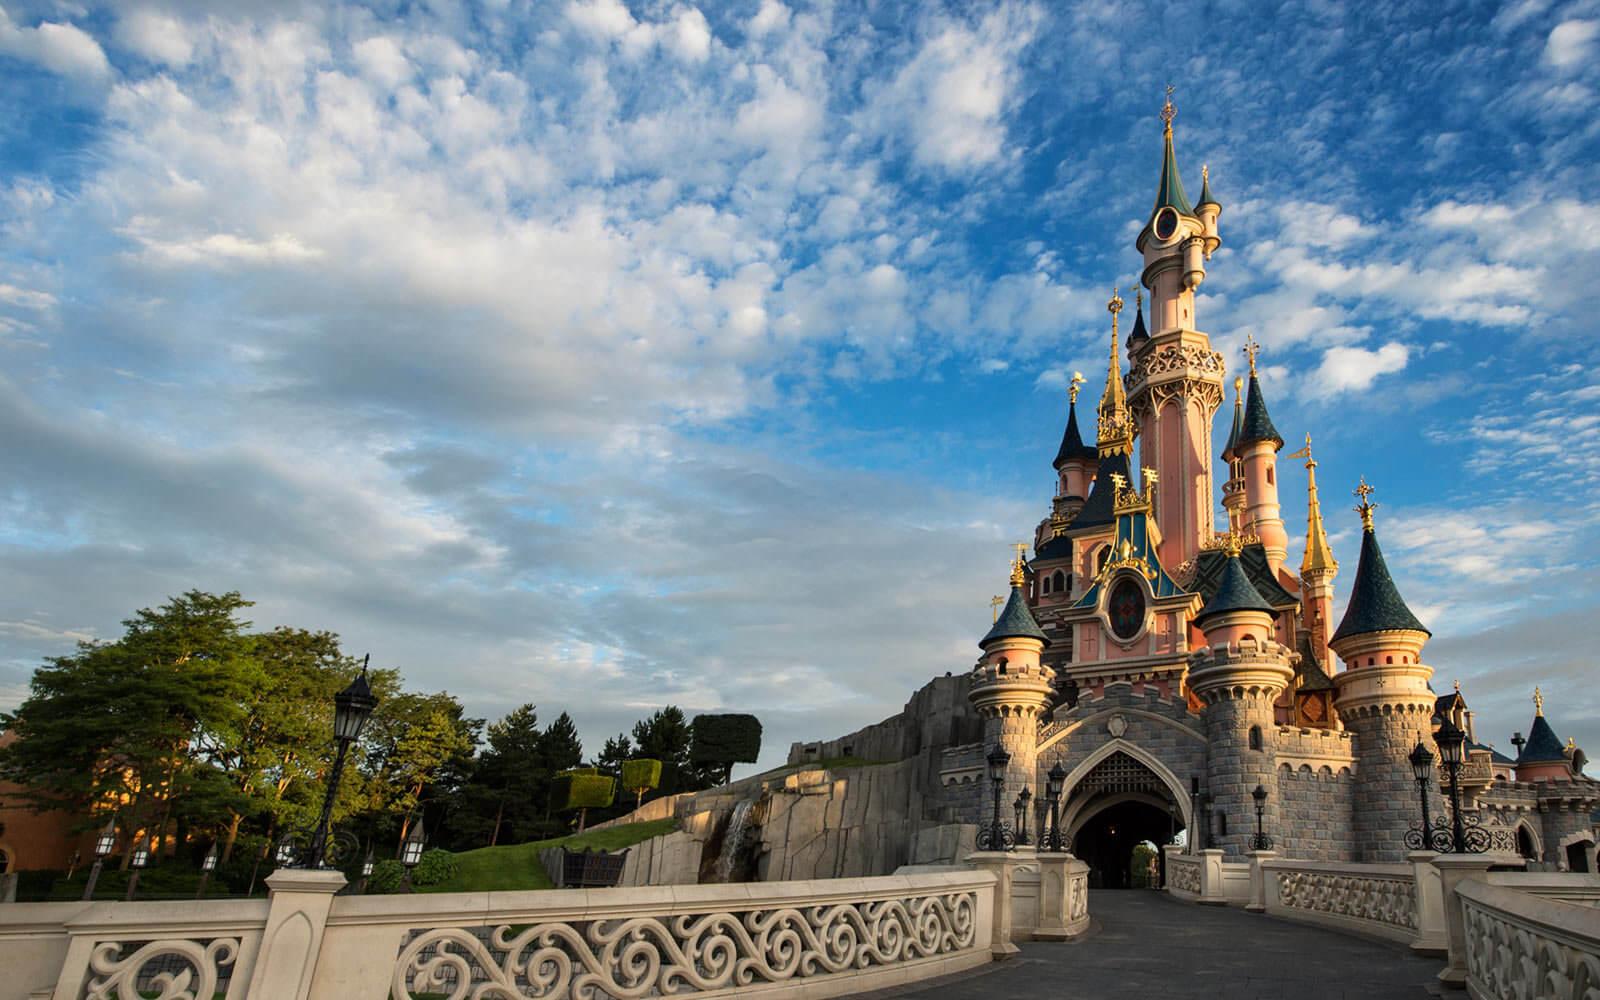 Visiting The Disneyland In Paris